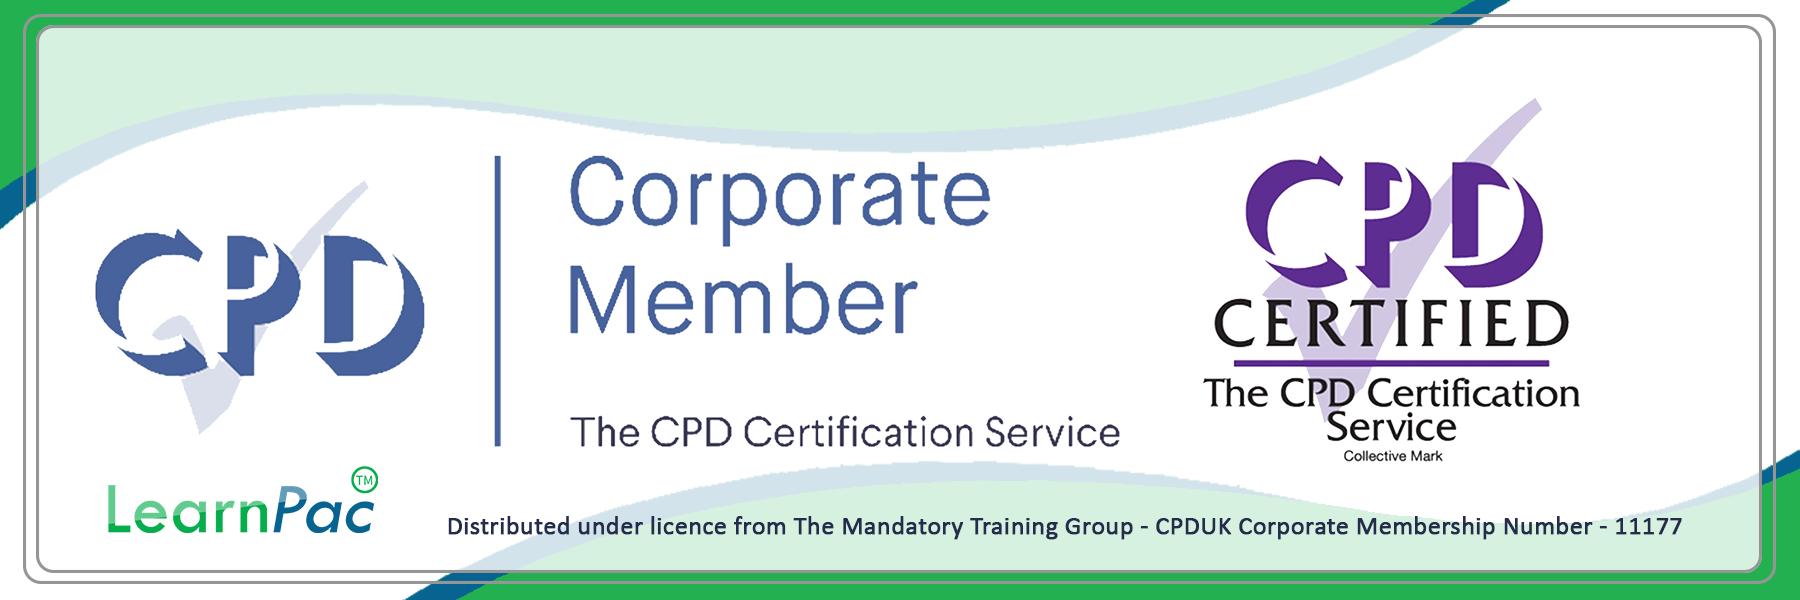 Care Certificate Standard 9 - CPDUK Certified - Learnpac System UK -